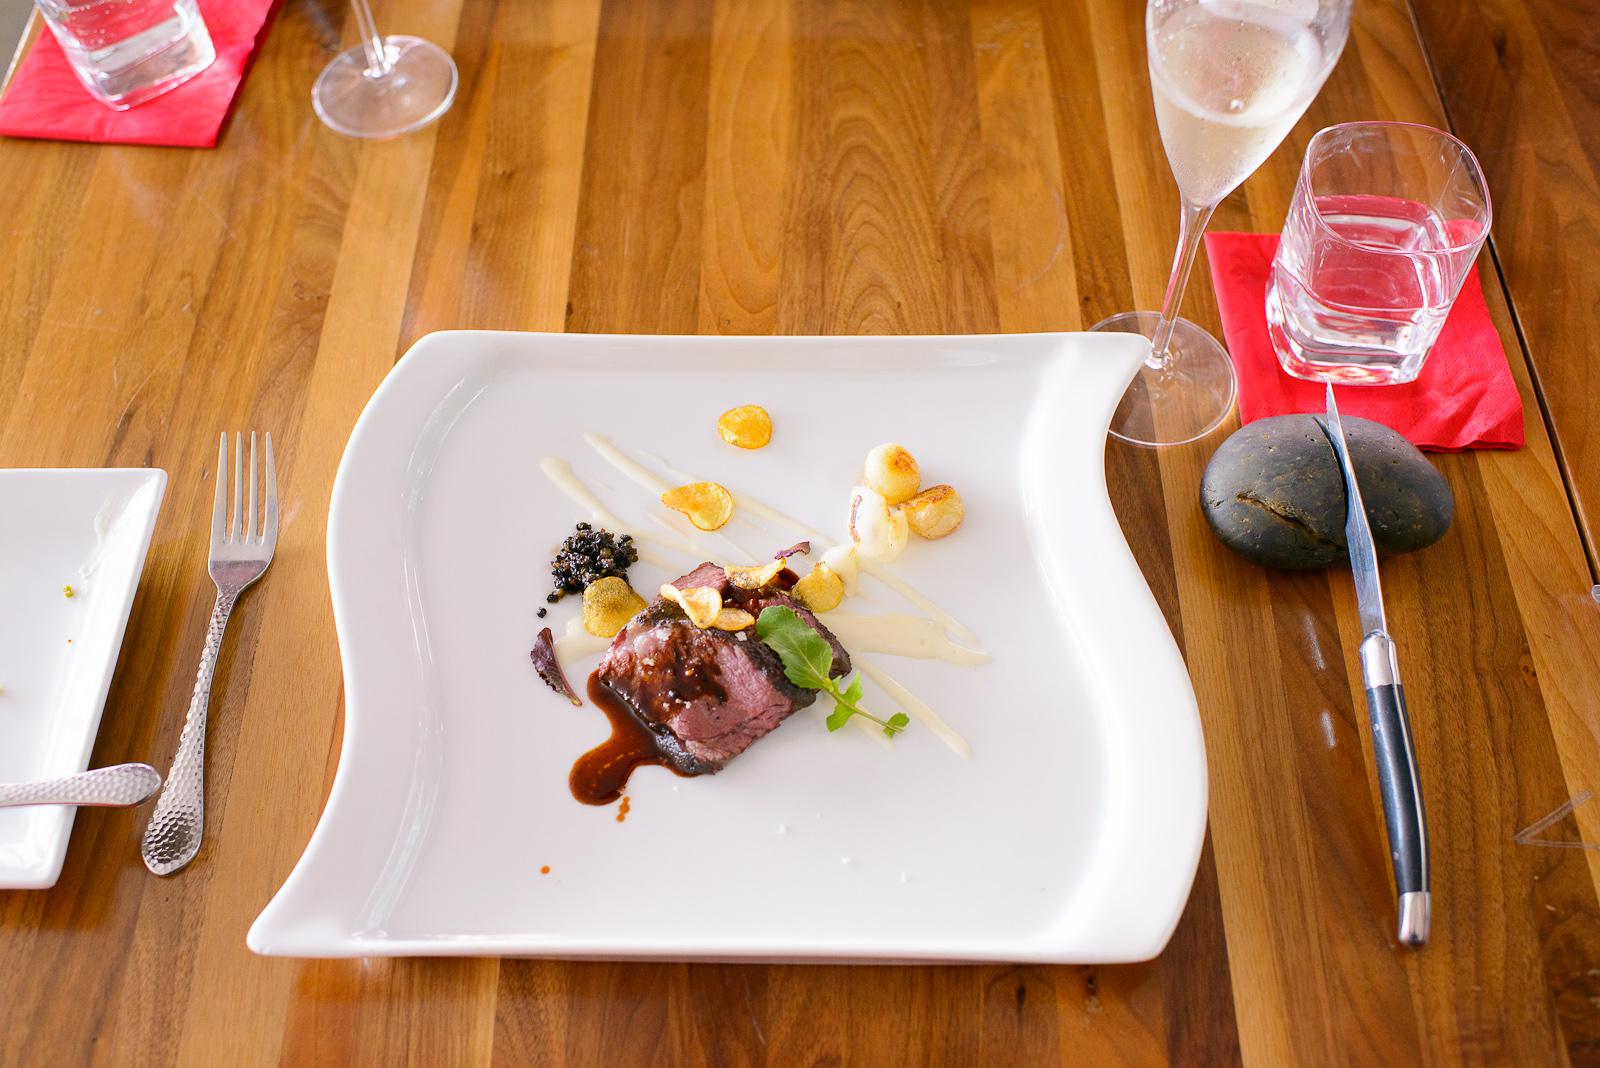 5th Course: Tablita (Rancho 17 Sonora México) - cocinada al alt